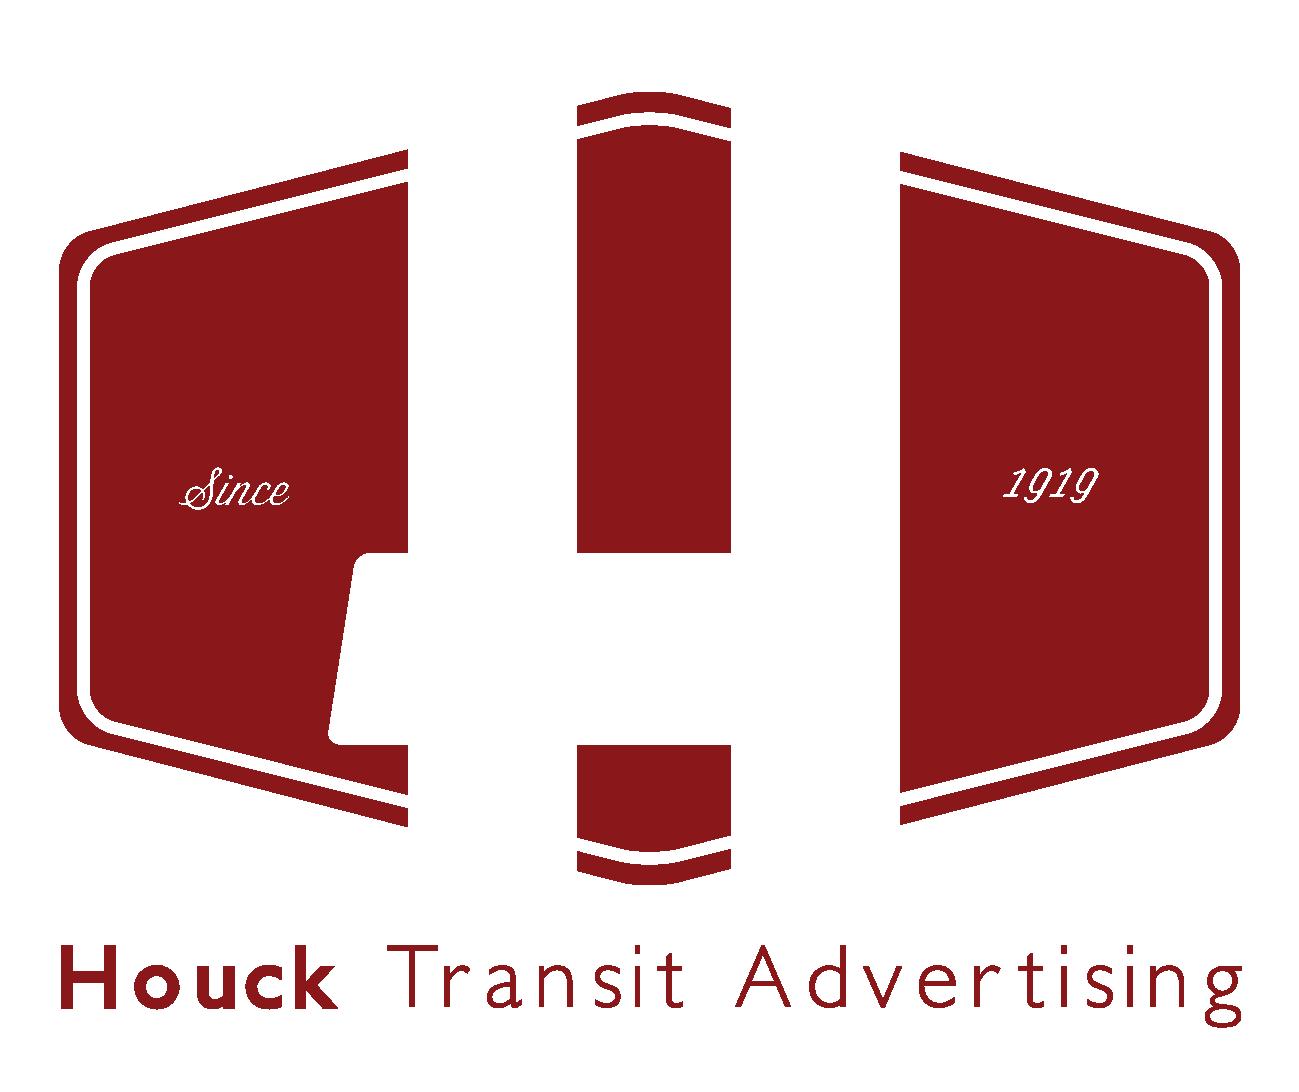 houck_logo.png